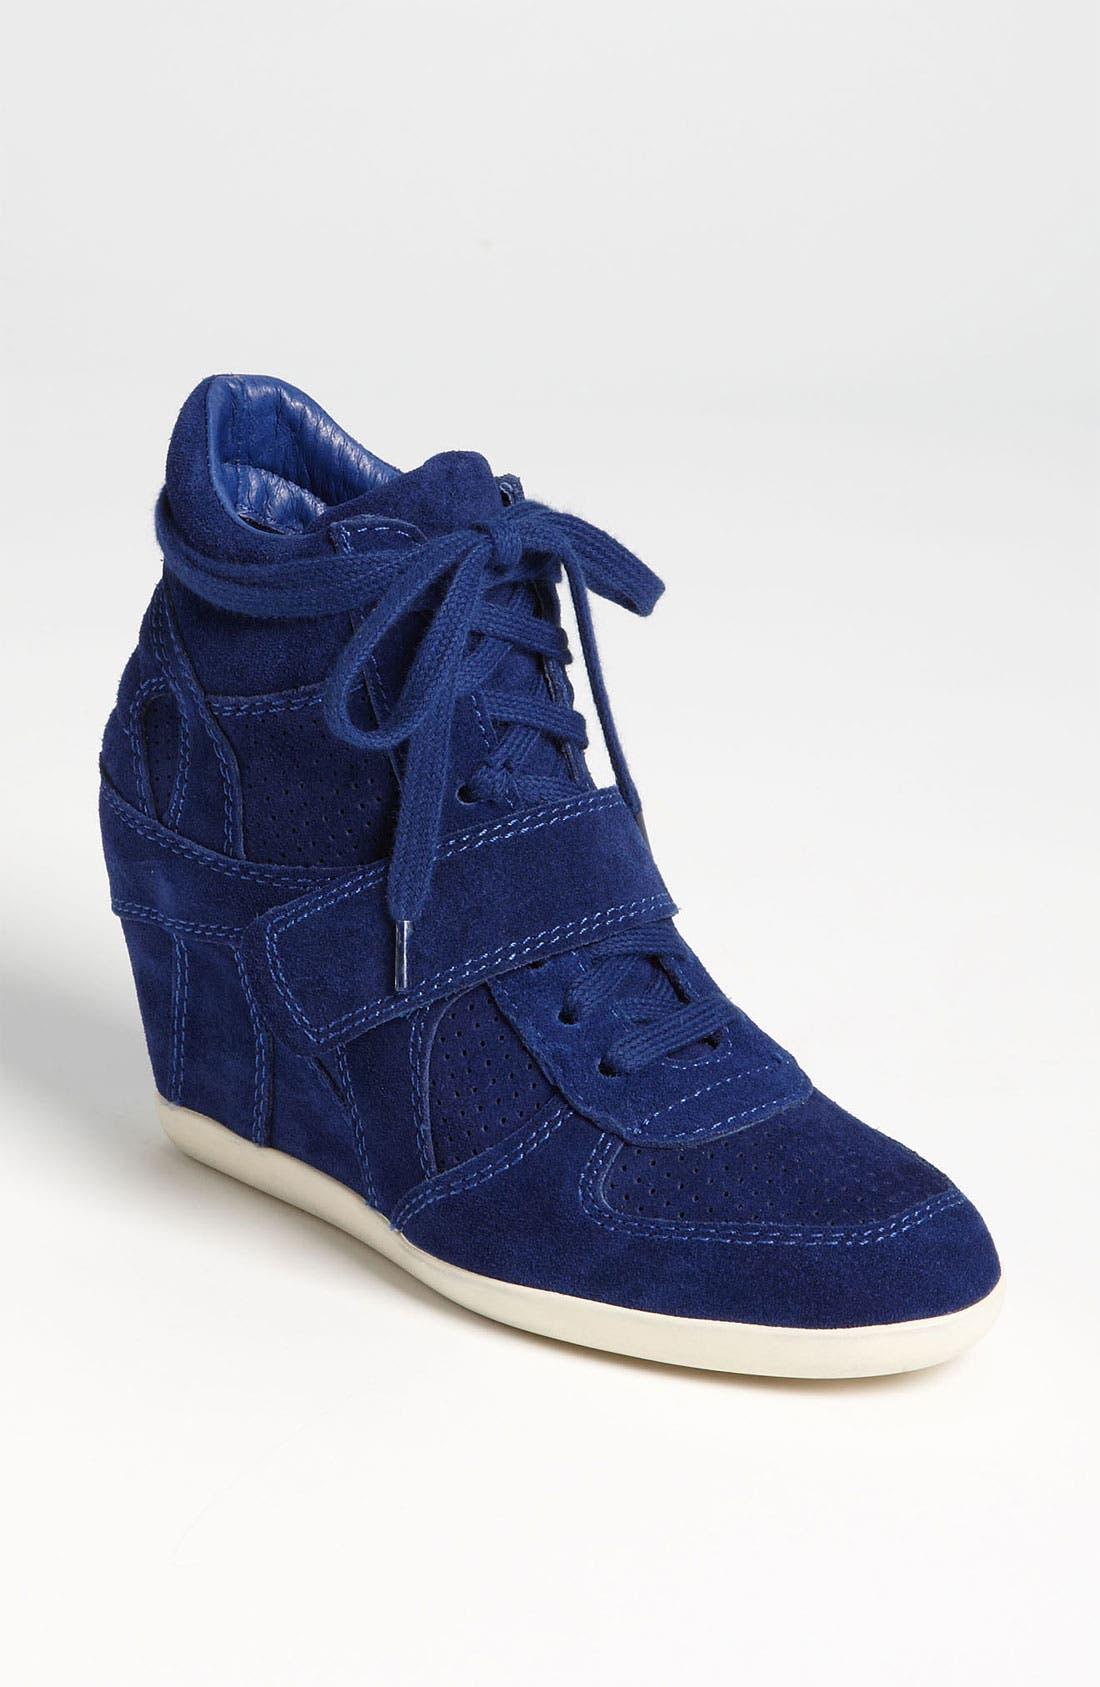 Main Image - Ash 'Bowie' Sneaker